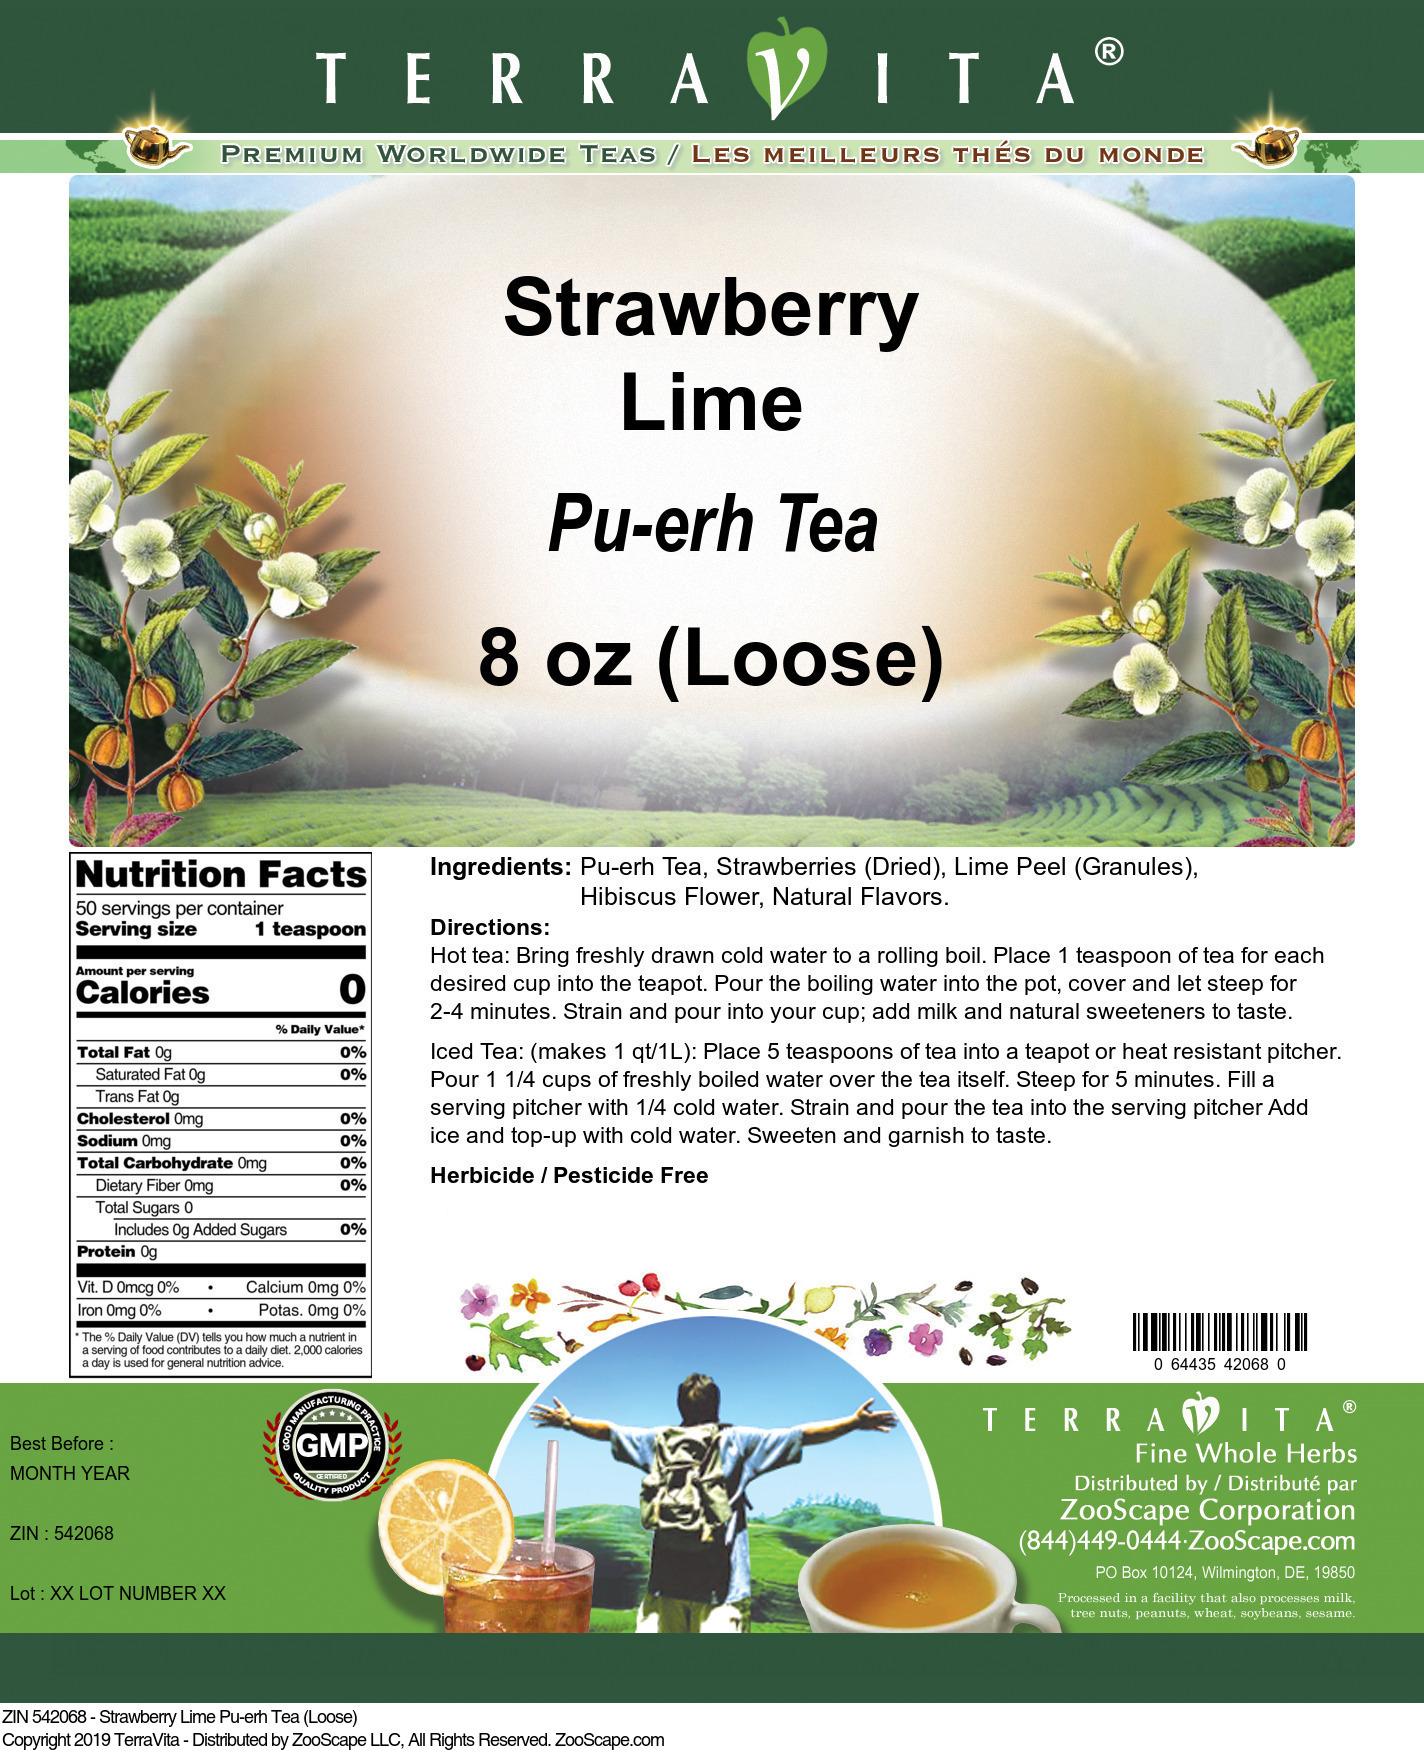 Strawberry Lime Pu-erh Tea (Loose)